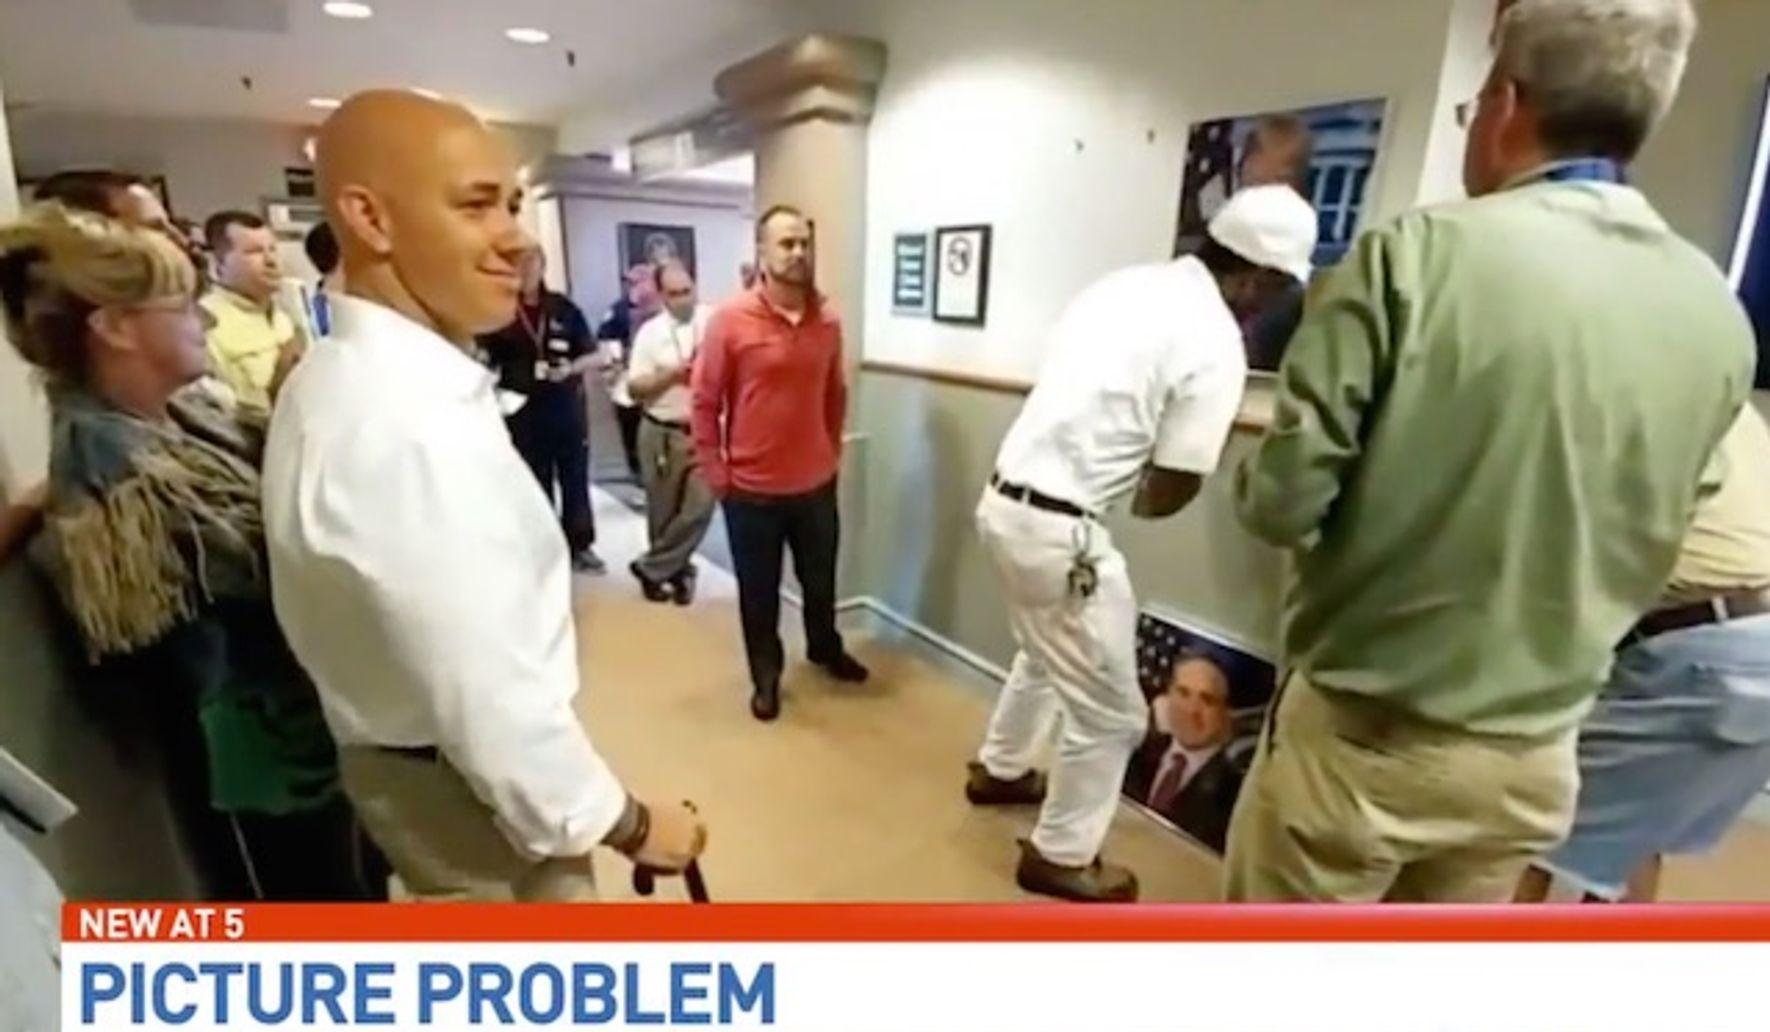 Brian Mast opens congressional office inside VA facility